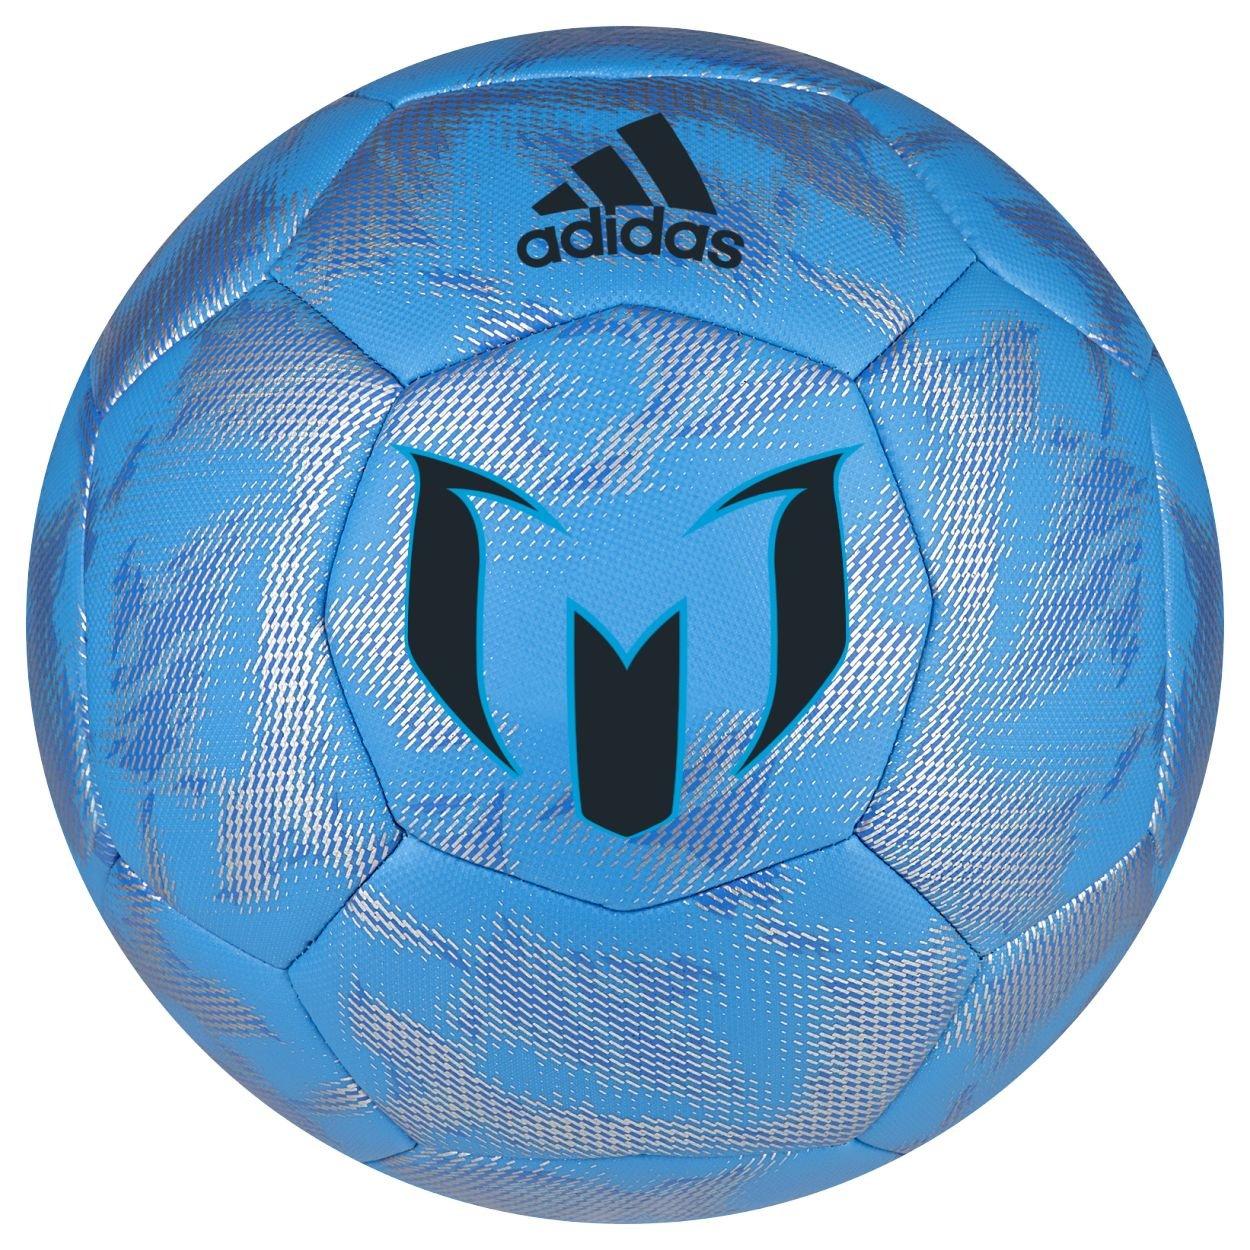 adidas Messi - Balón de fútbol (Azul Solar, fantomo y Plata ...